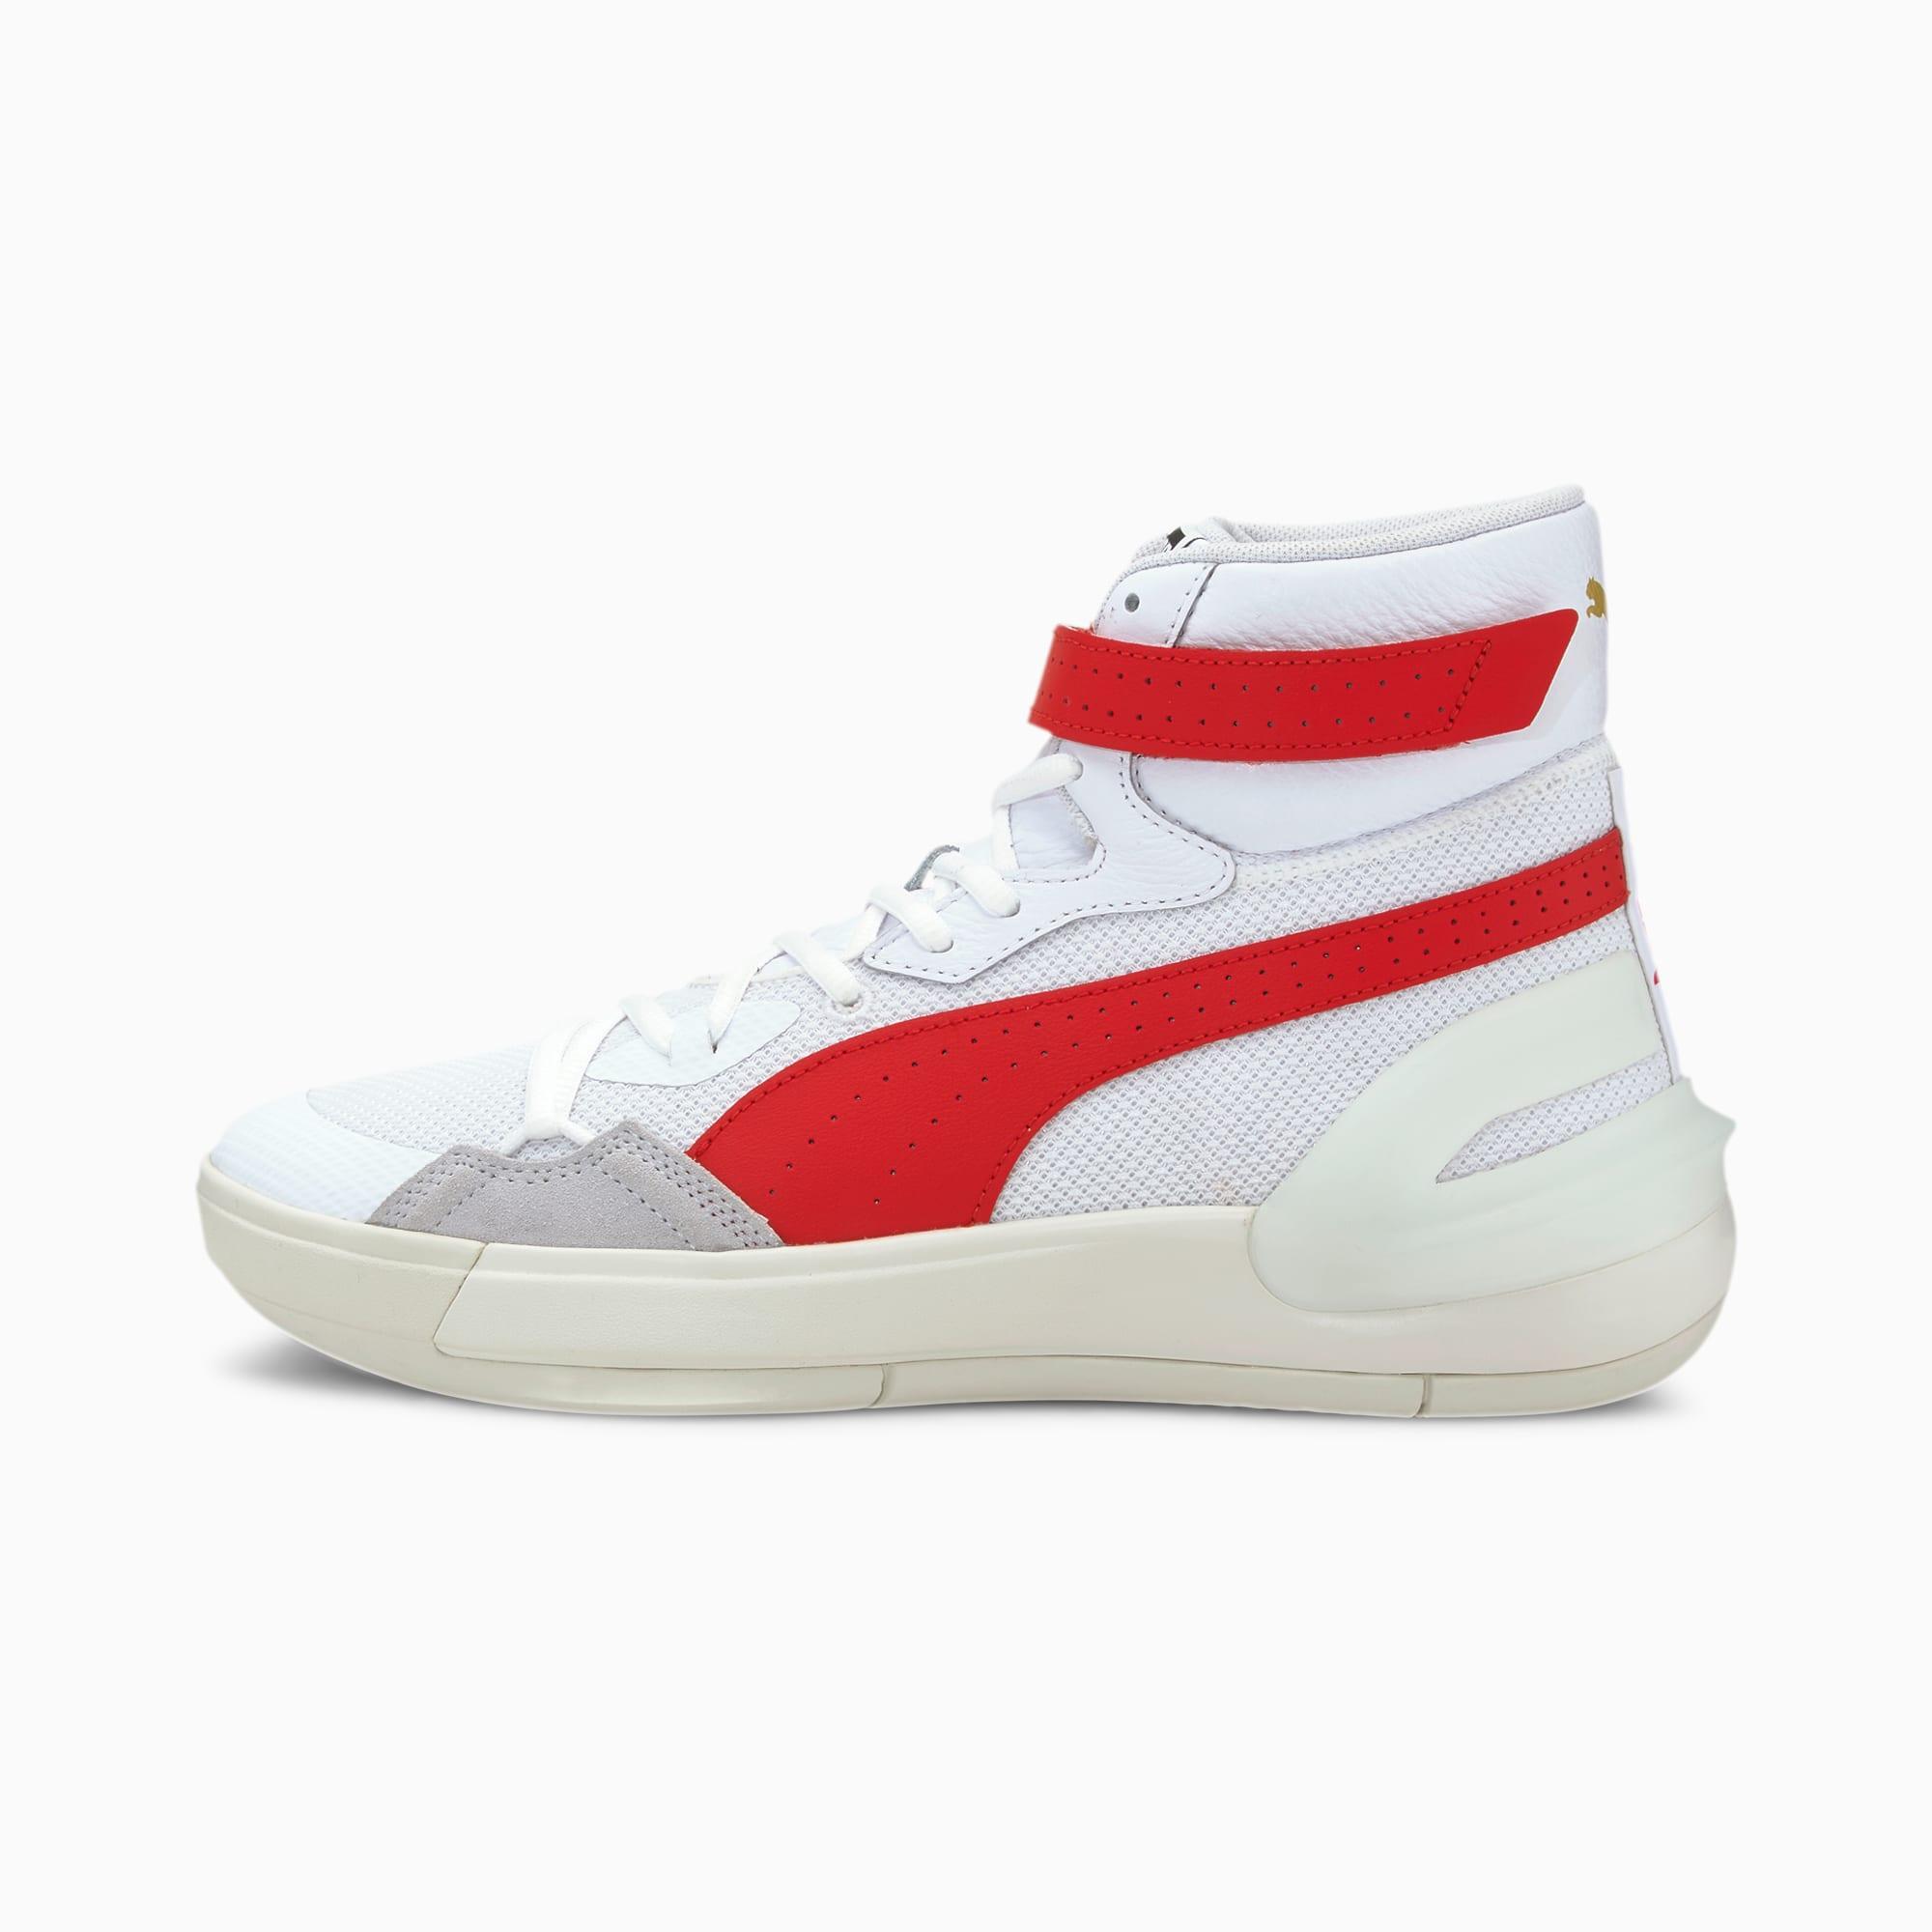 Puma US:Modern Basketball Shoes